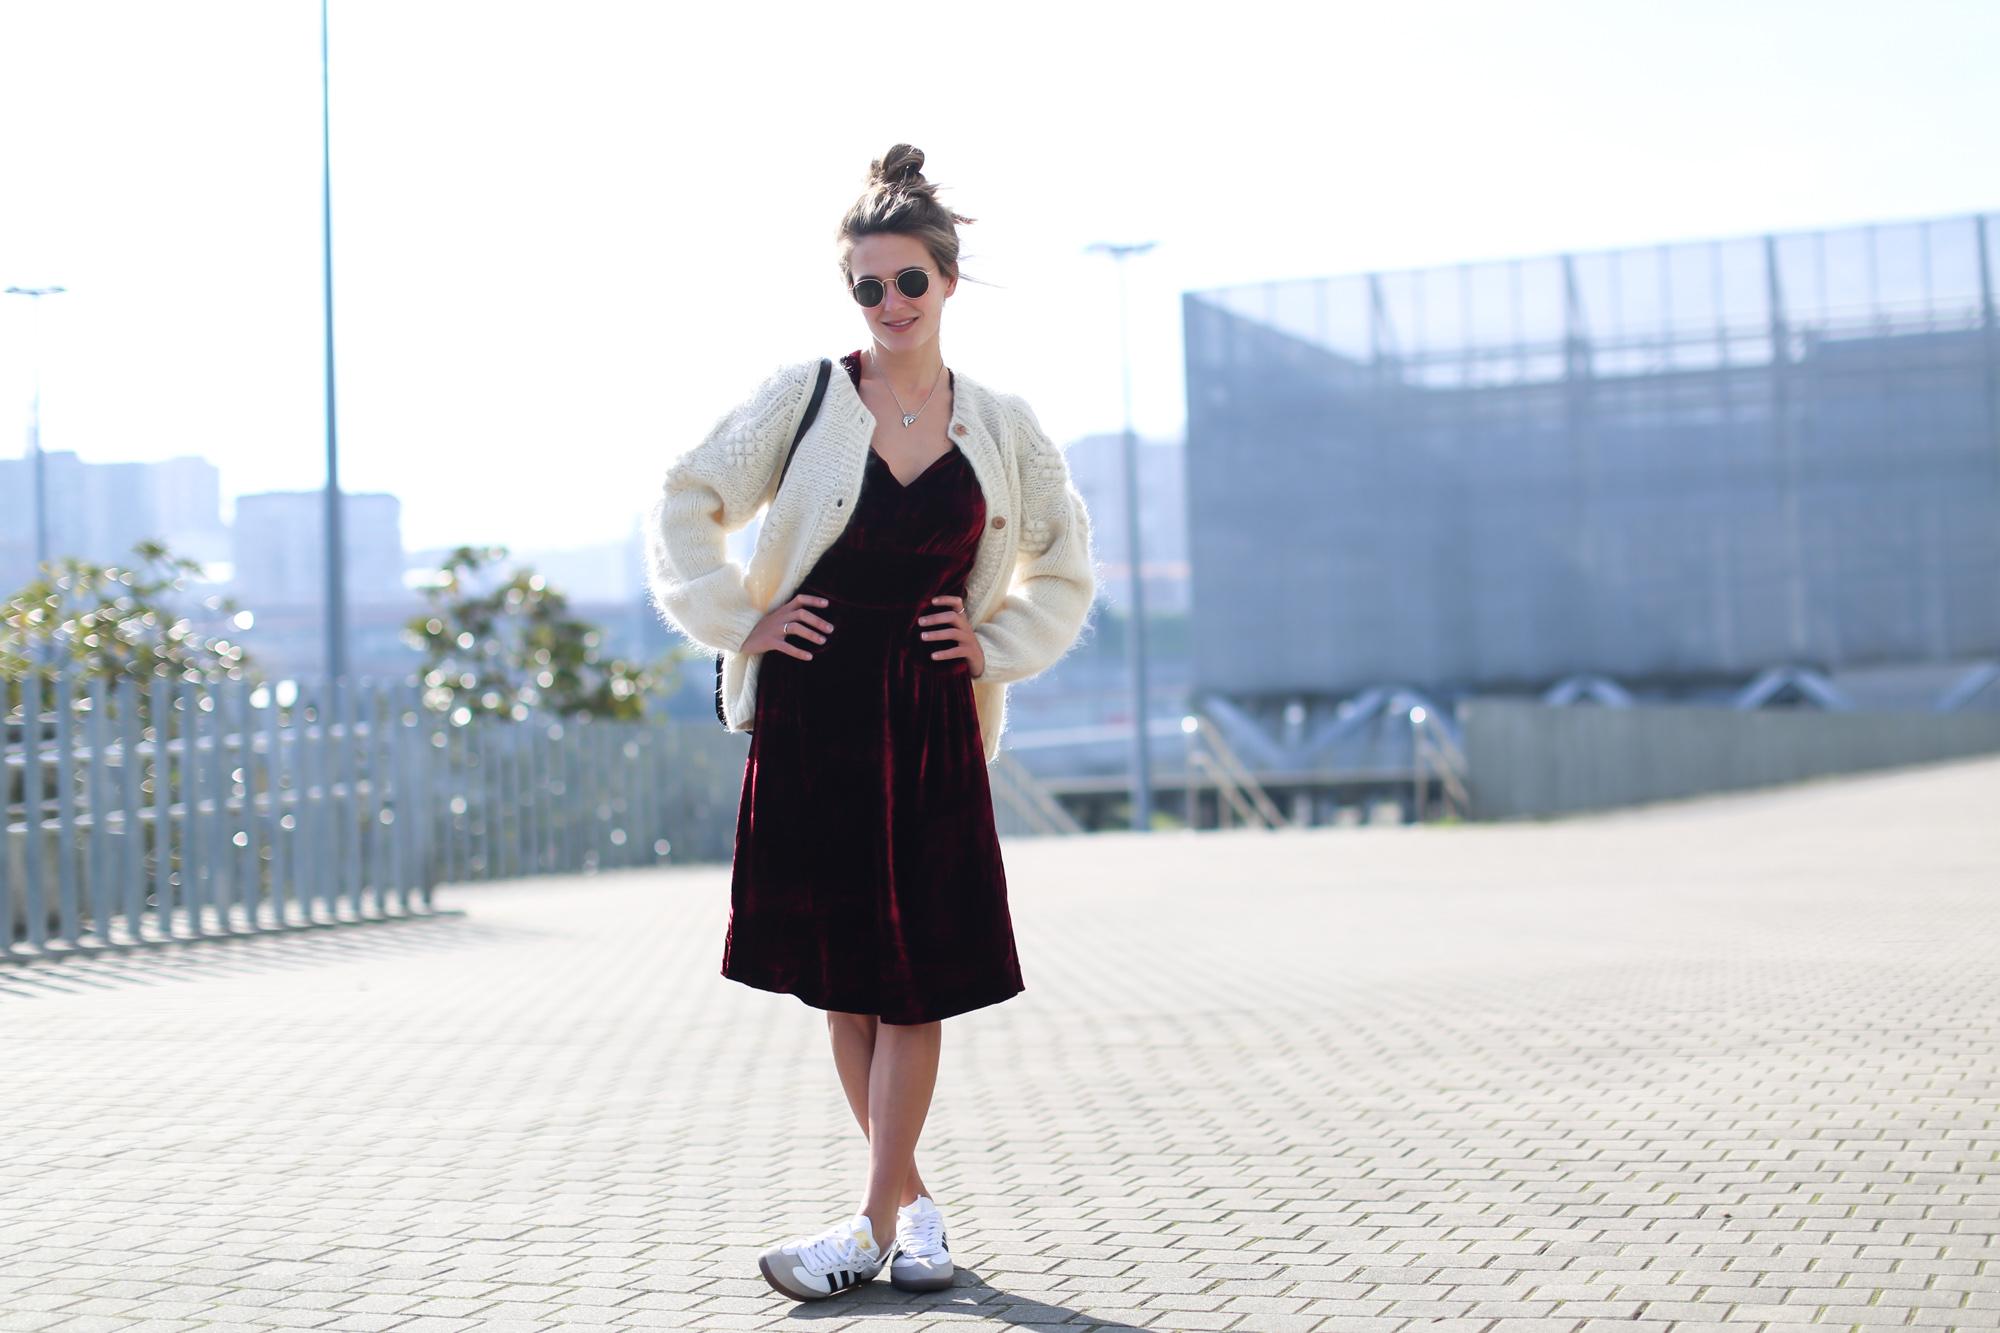 Clochet_streetstyle_fashionblogger_intropia_jerseylanaochosabiertogordito_vestidoterciopelomasscob_adidassambablancas-2